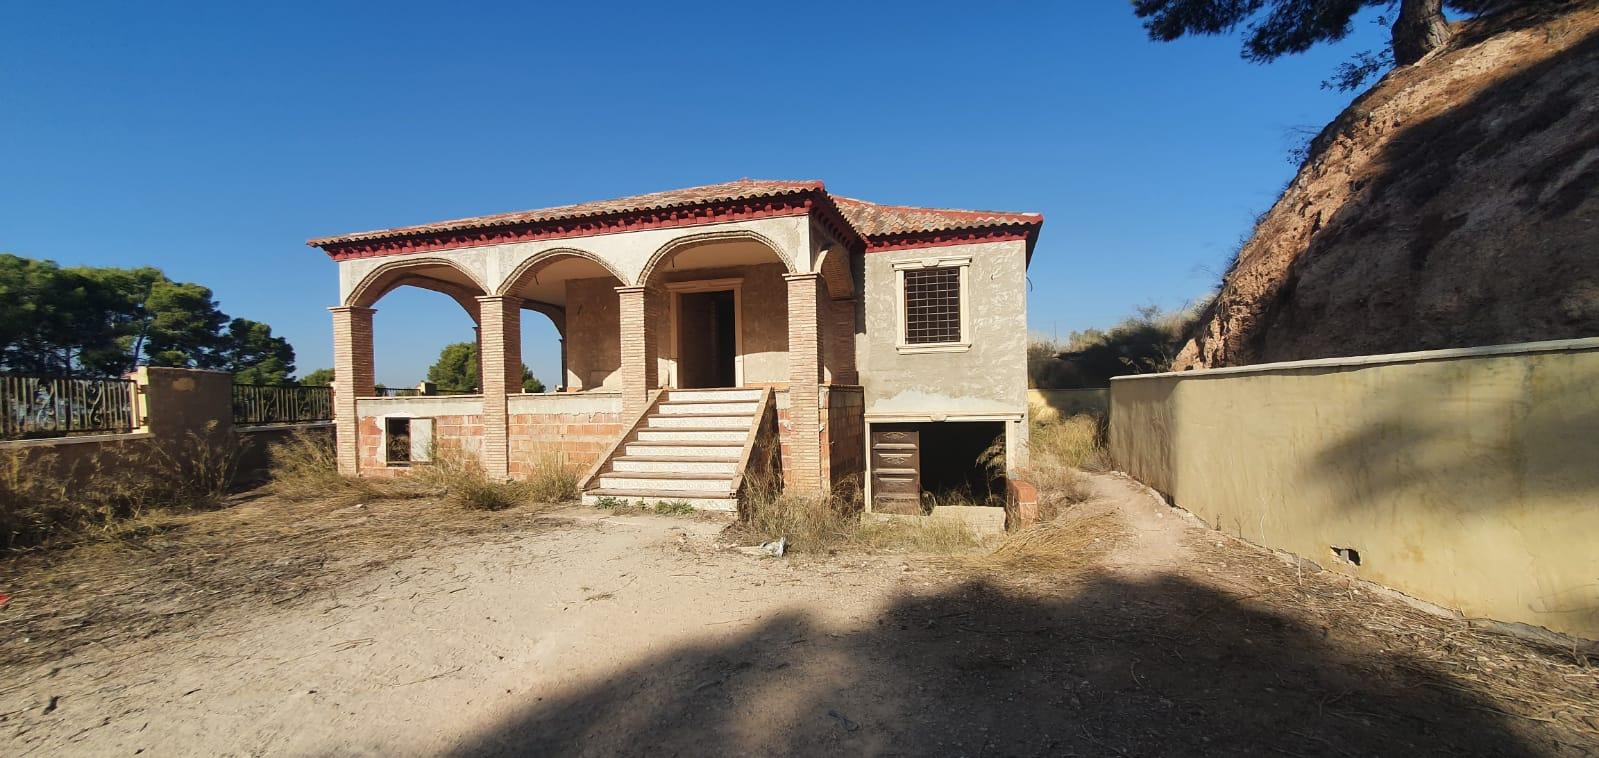 Ref:kf943712 Country House or Finca For Sale in Sangonera la Verde